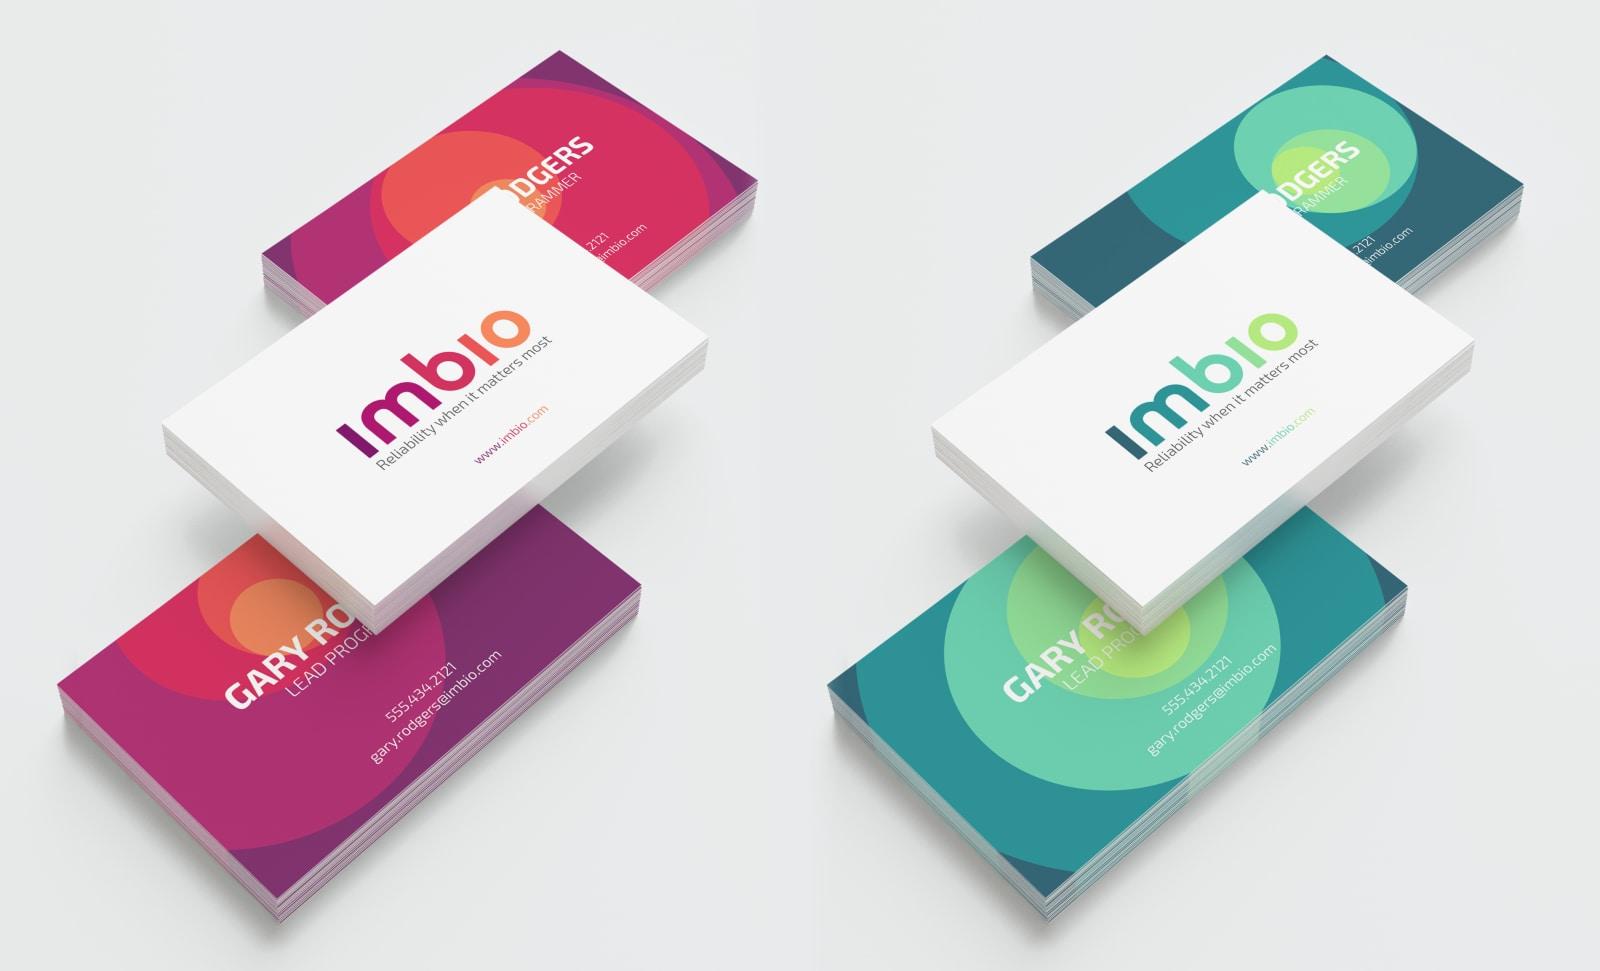 Imbio Business Cards